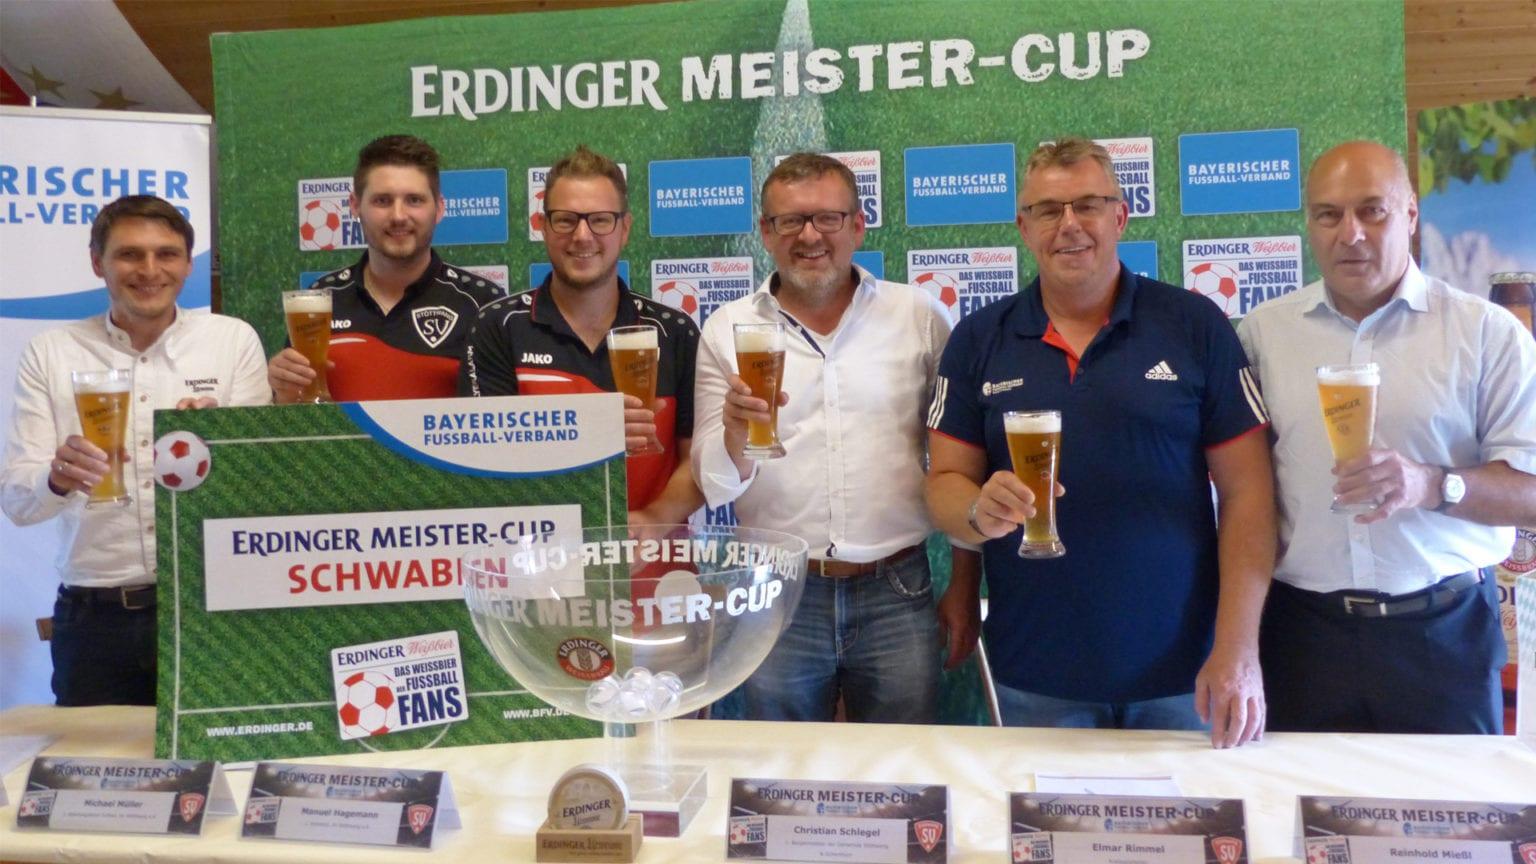 ERDINGER Meister-Cup_Pressegespräch SV Stöttwang